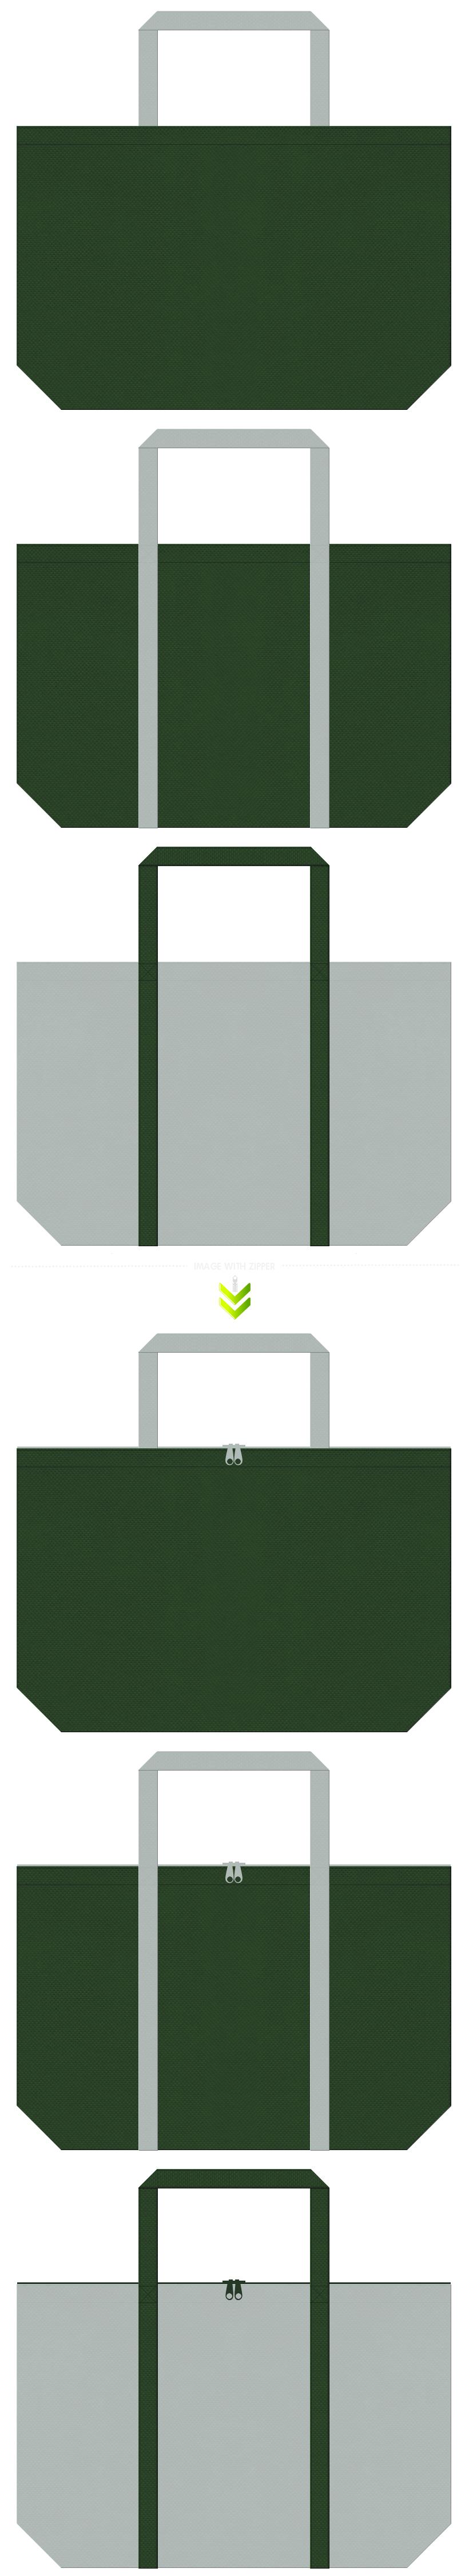 CO2削減・屋上緑化・壁面緑化・建築・設計・エクステリアのエコバッグにお奨めの不織布バッグデザイン:濃緑色・深緑色とグレー色のコーデ